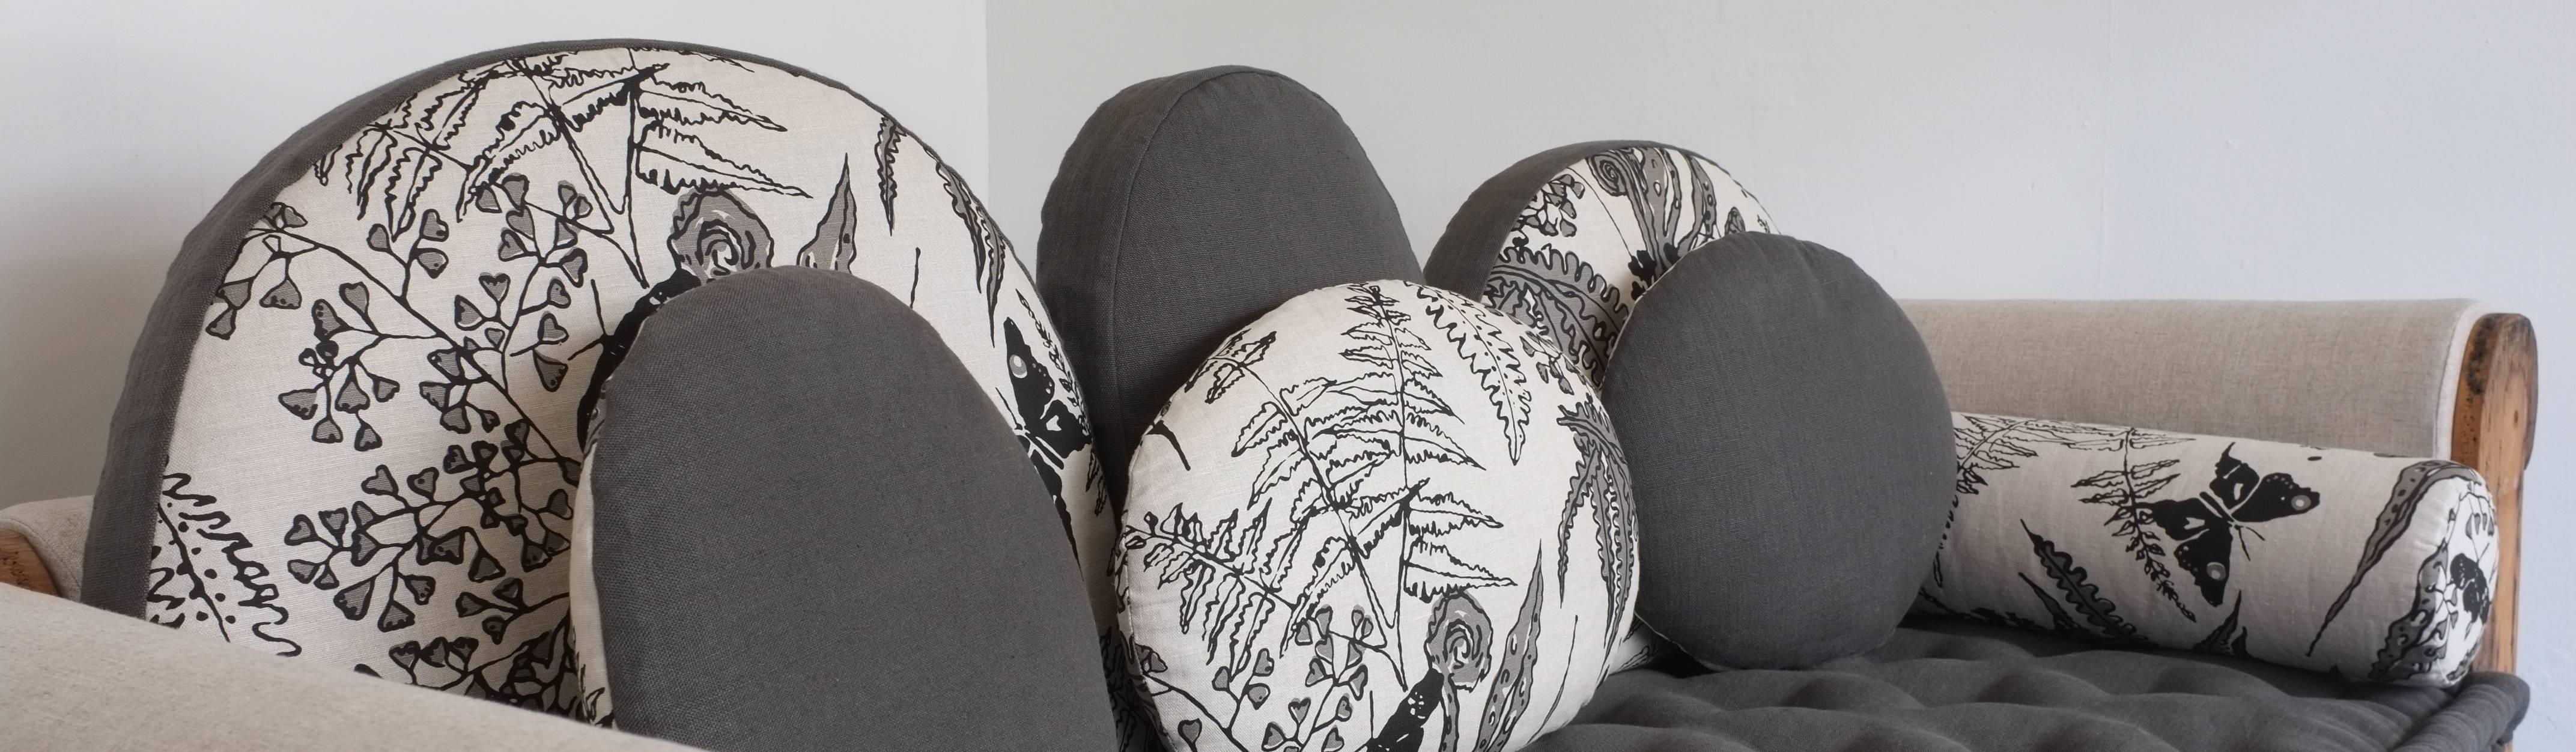 Urban Upholstery